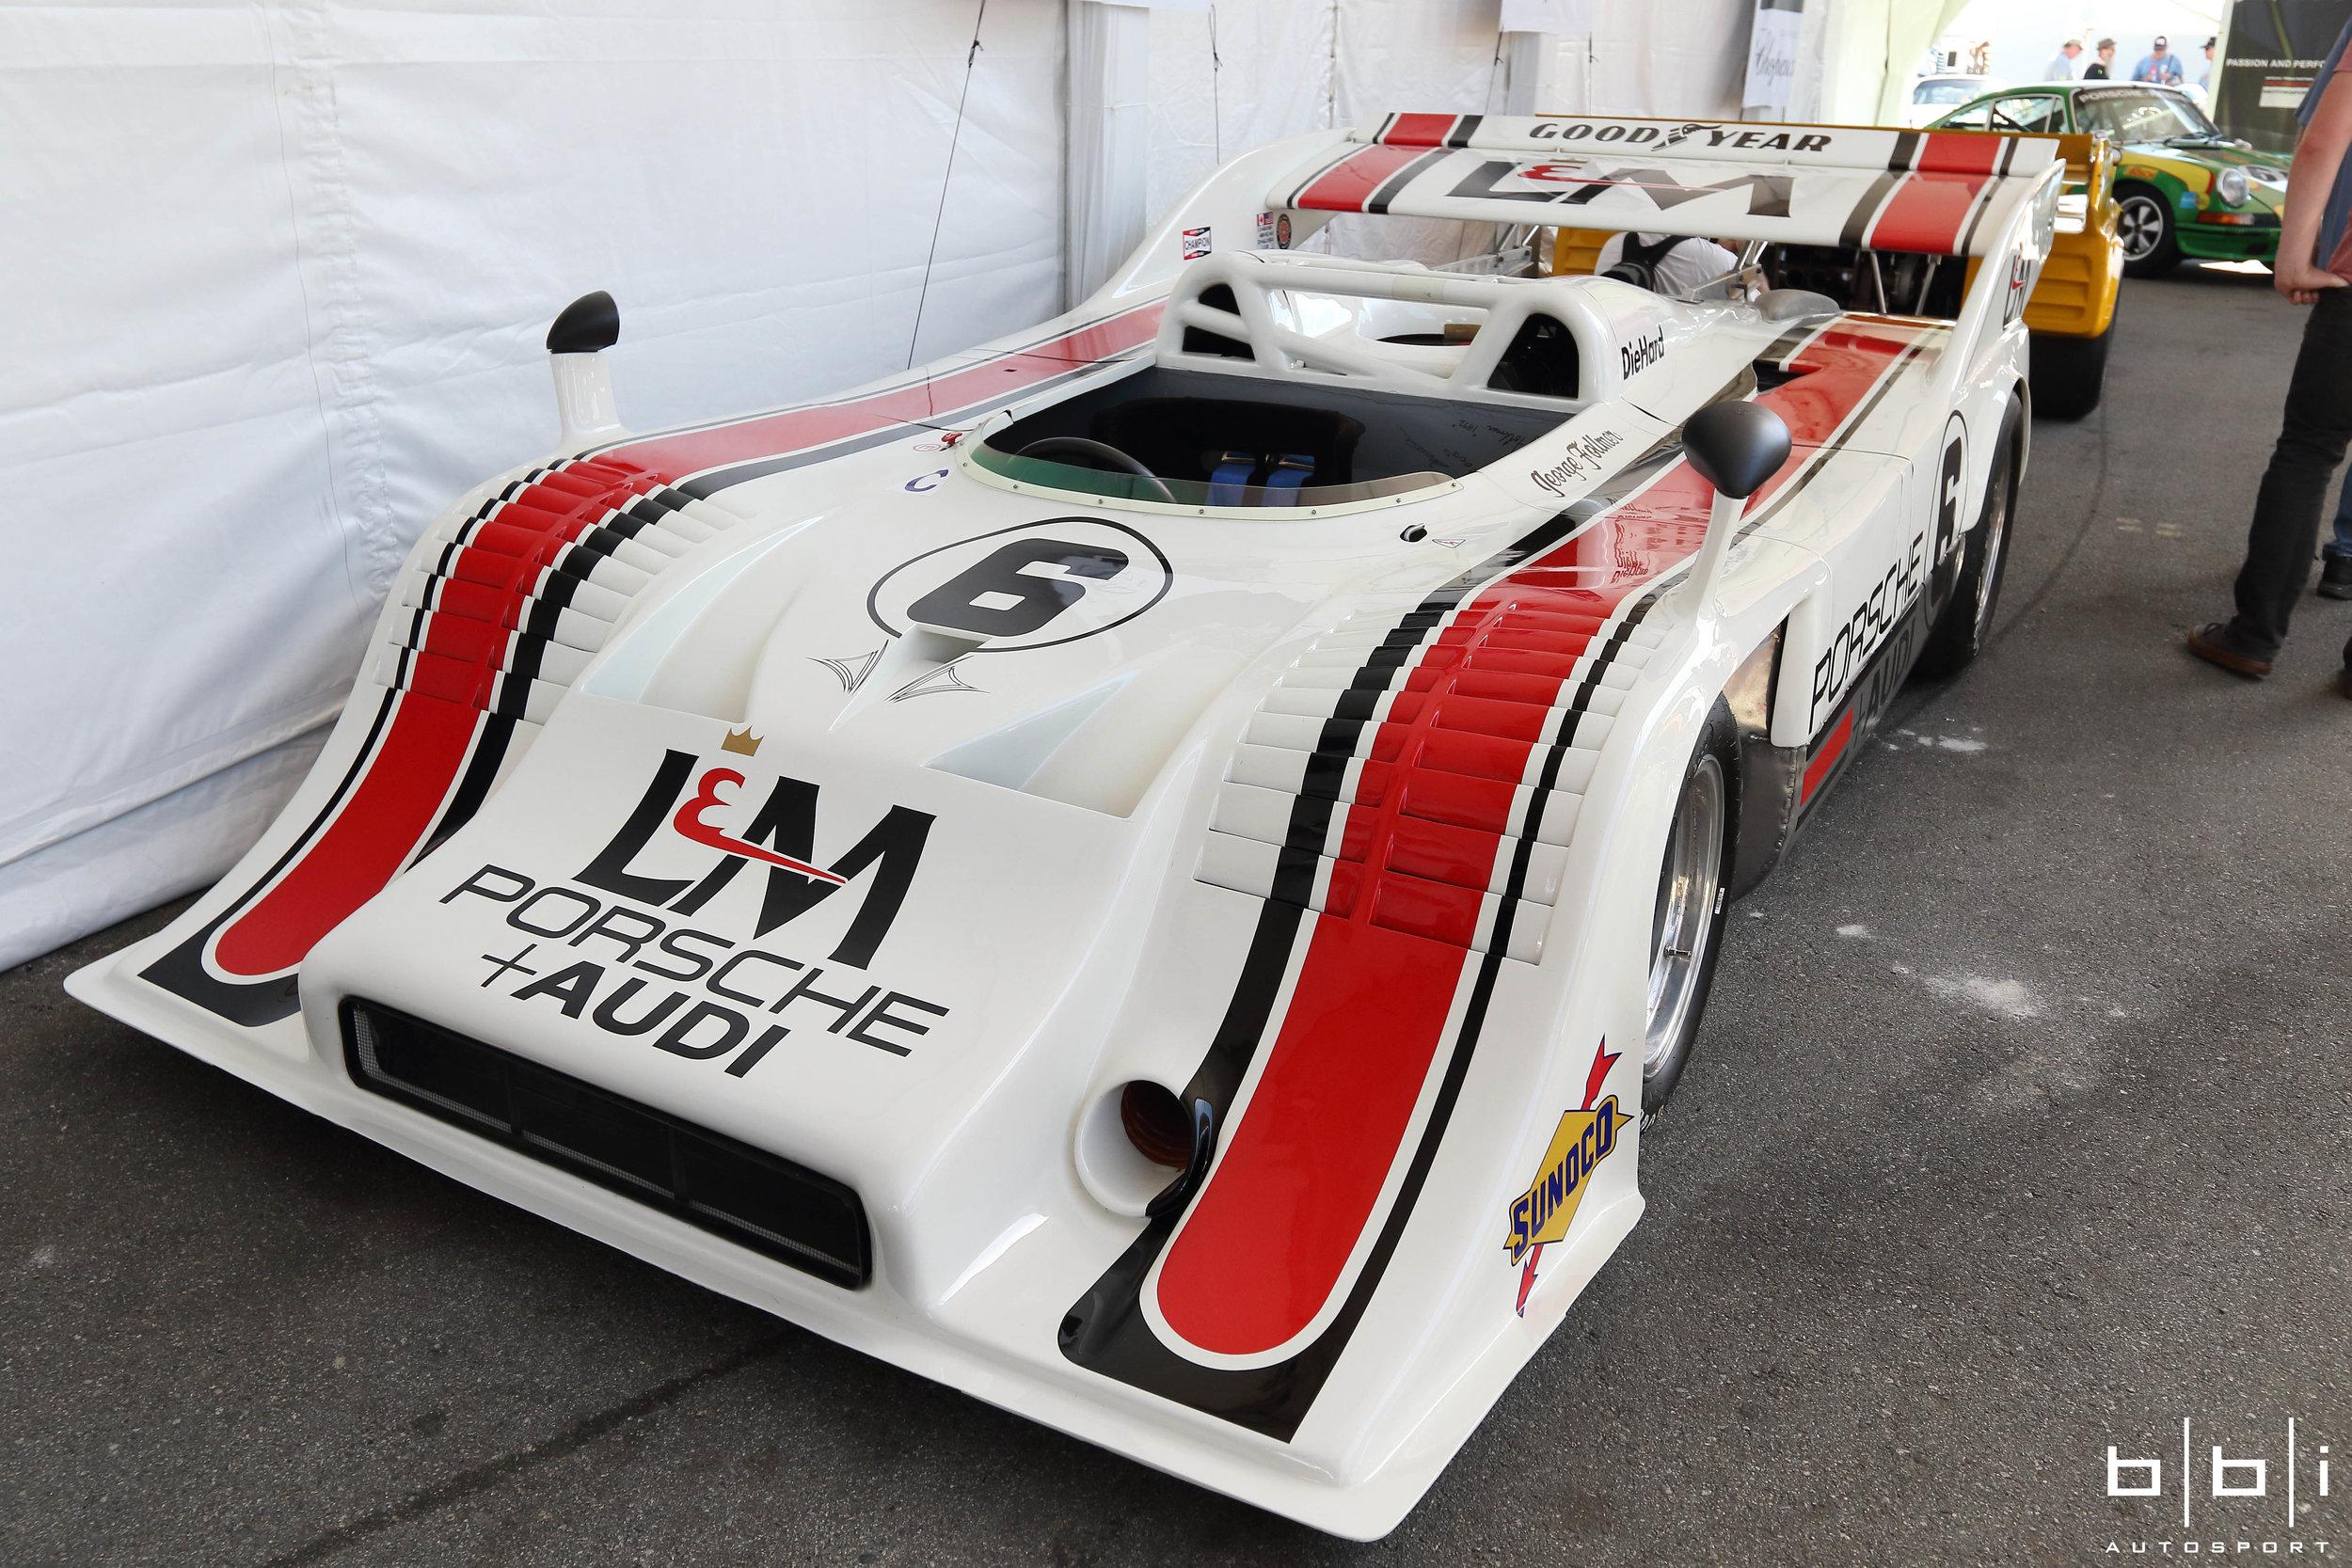 #6 1972 LM Porsche 917/10 Can-Am Driven by George Follmer